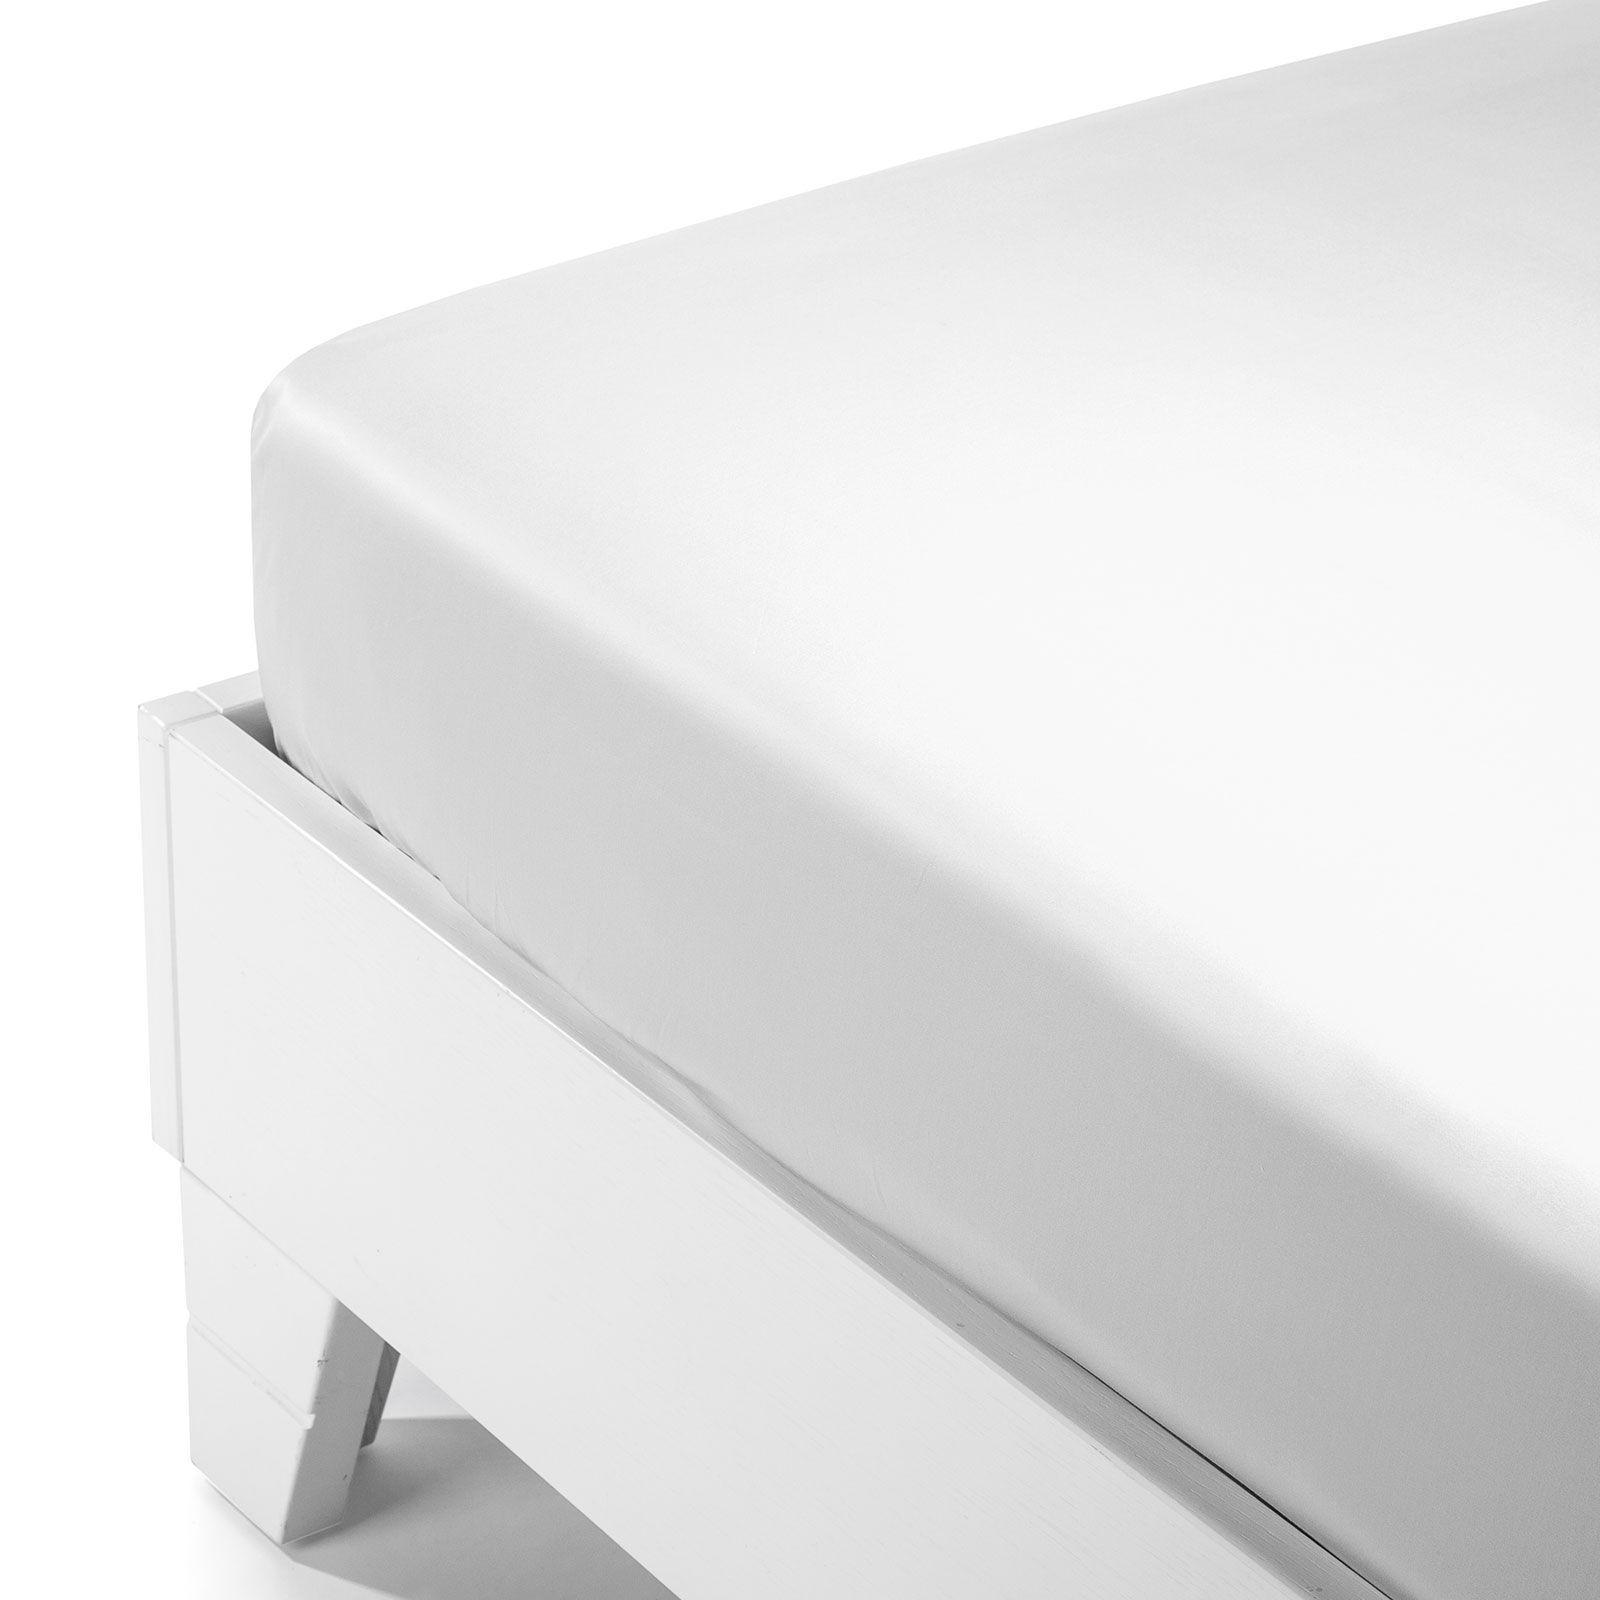 На резинке Простыня на резинке 160x200 Сaleffi Raso Tinta Unito с бордюром сатин белая prostynya-na-rezinke-90x200-saleffi-raso-tinta-unito-bianco-italiya.jpg